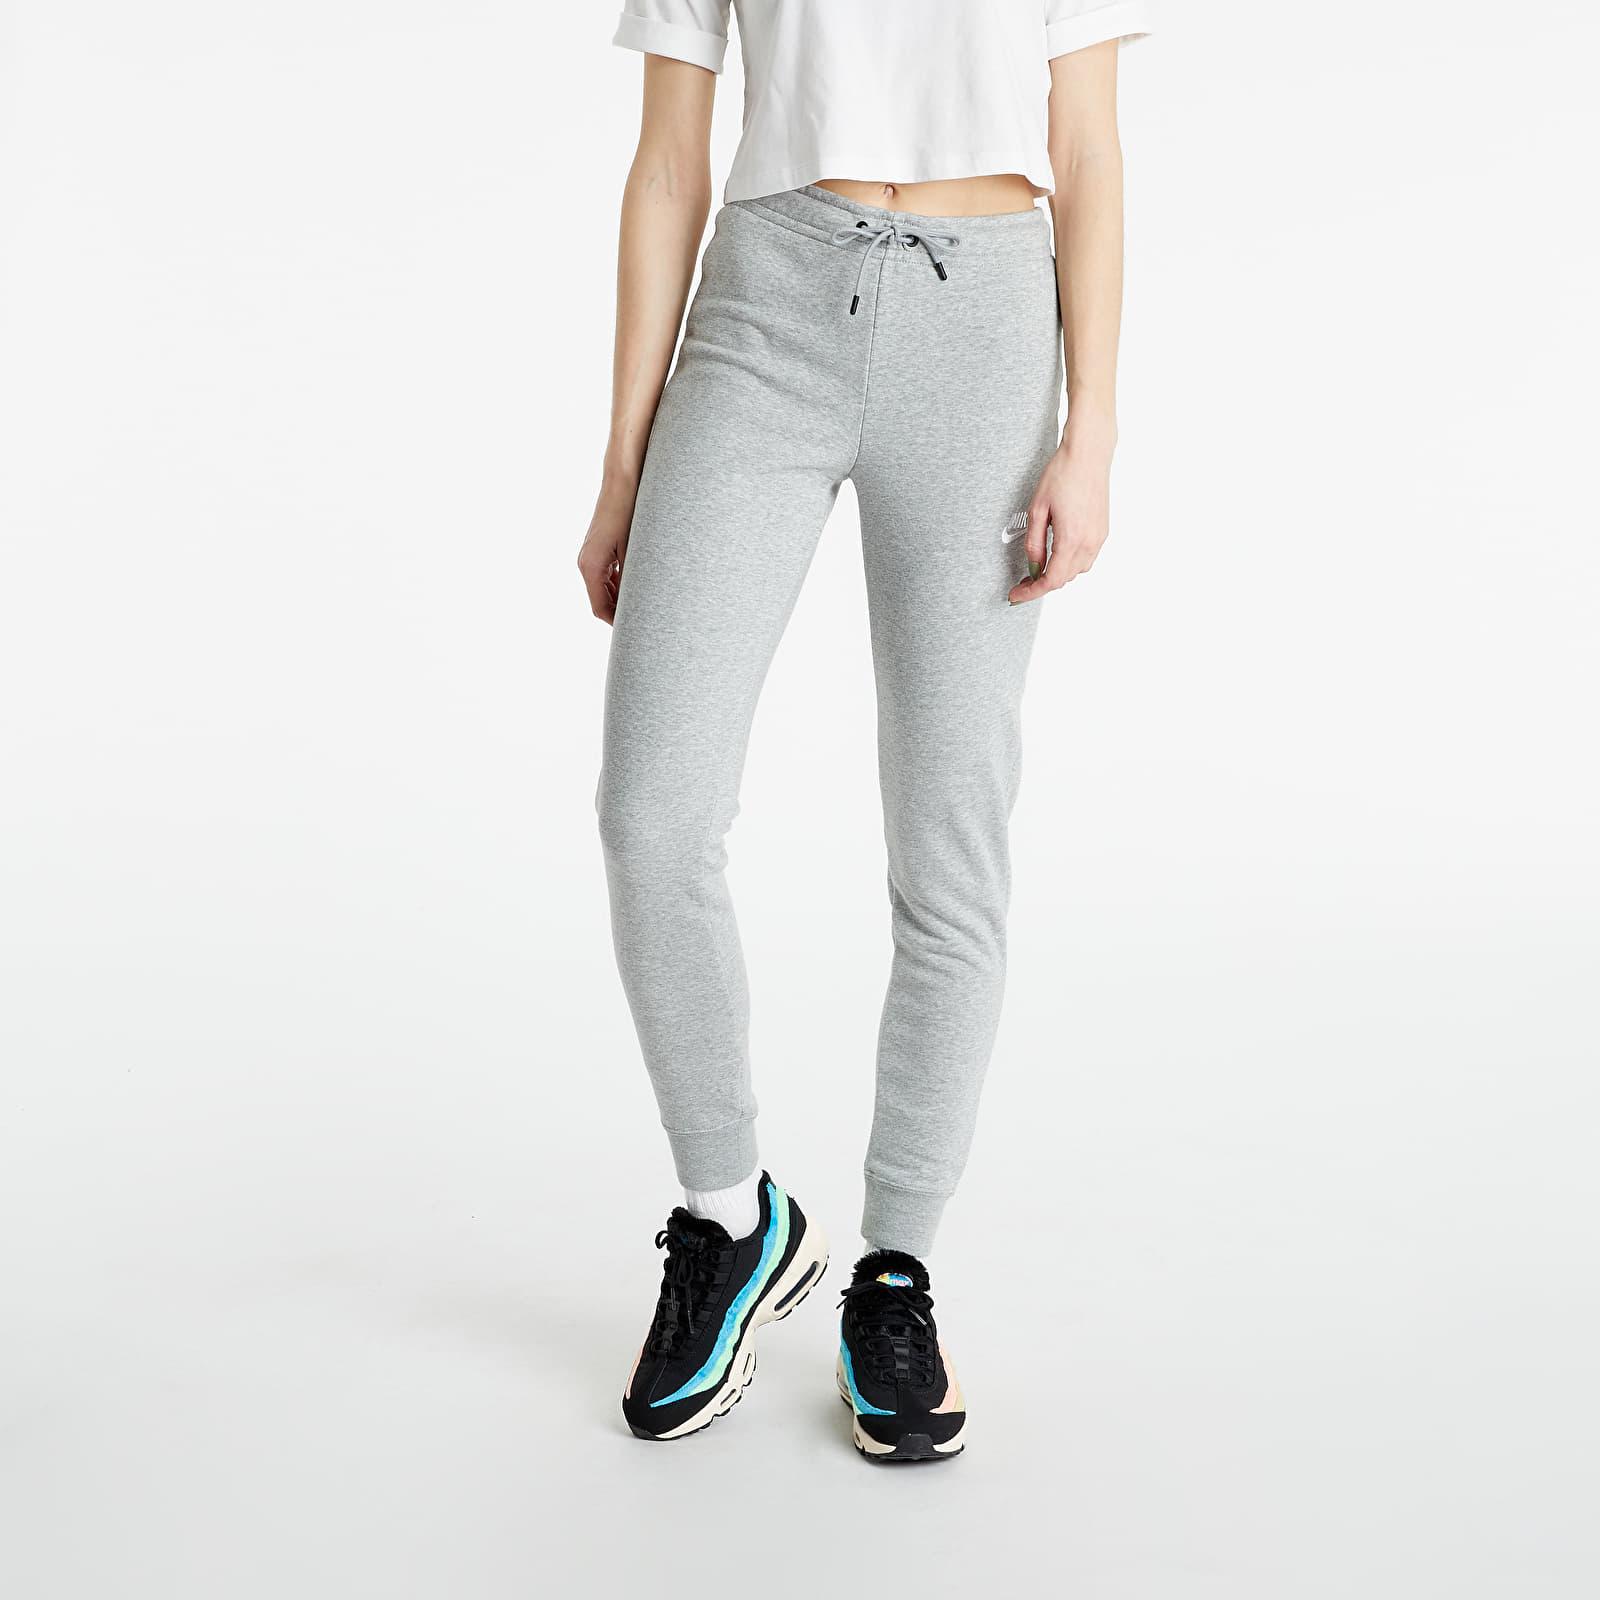 Nike Sportswear W Essential Fleece Mr Pant Tight DK Grey Heather/ White